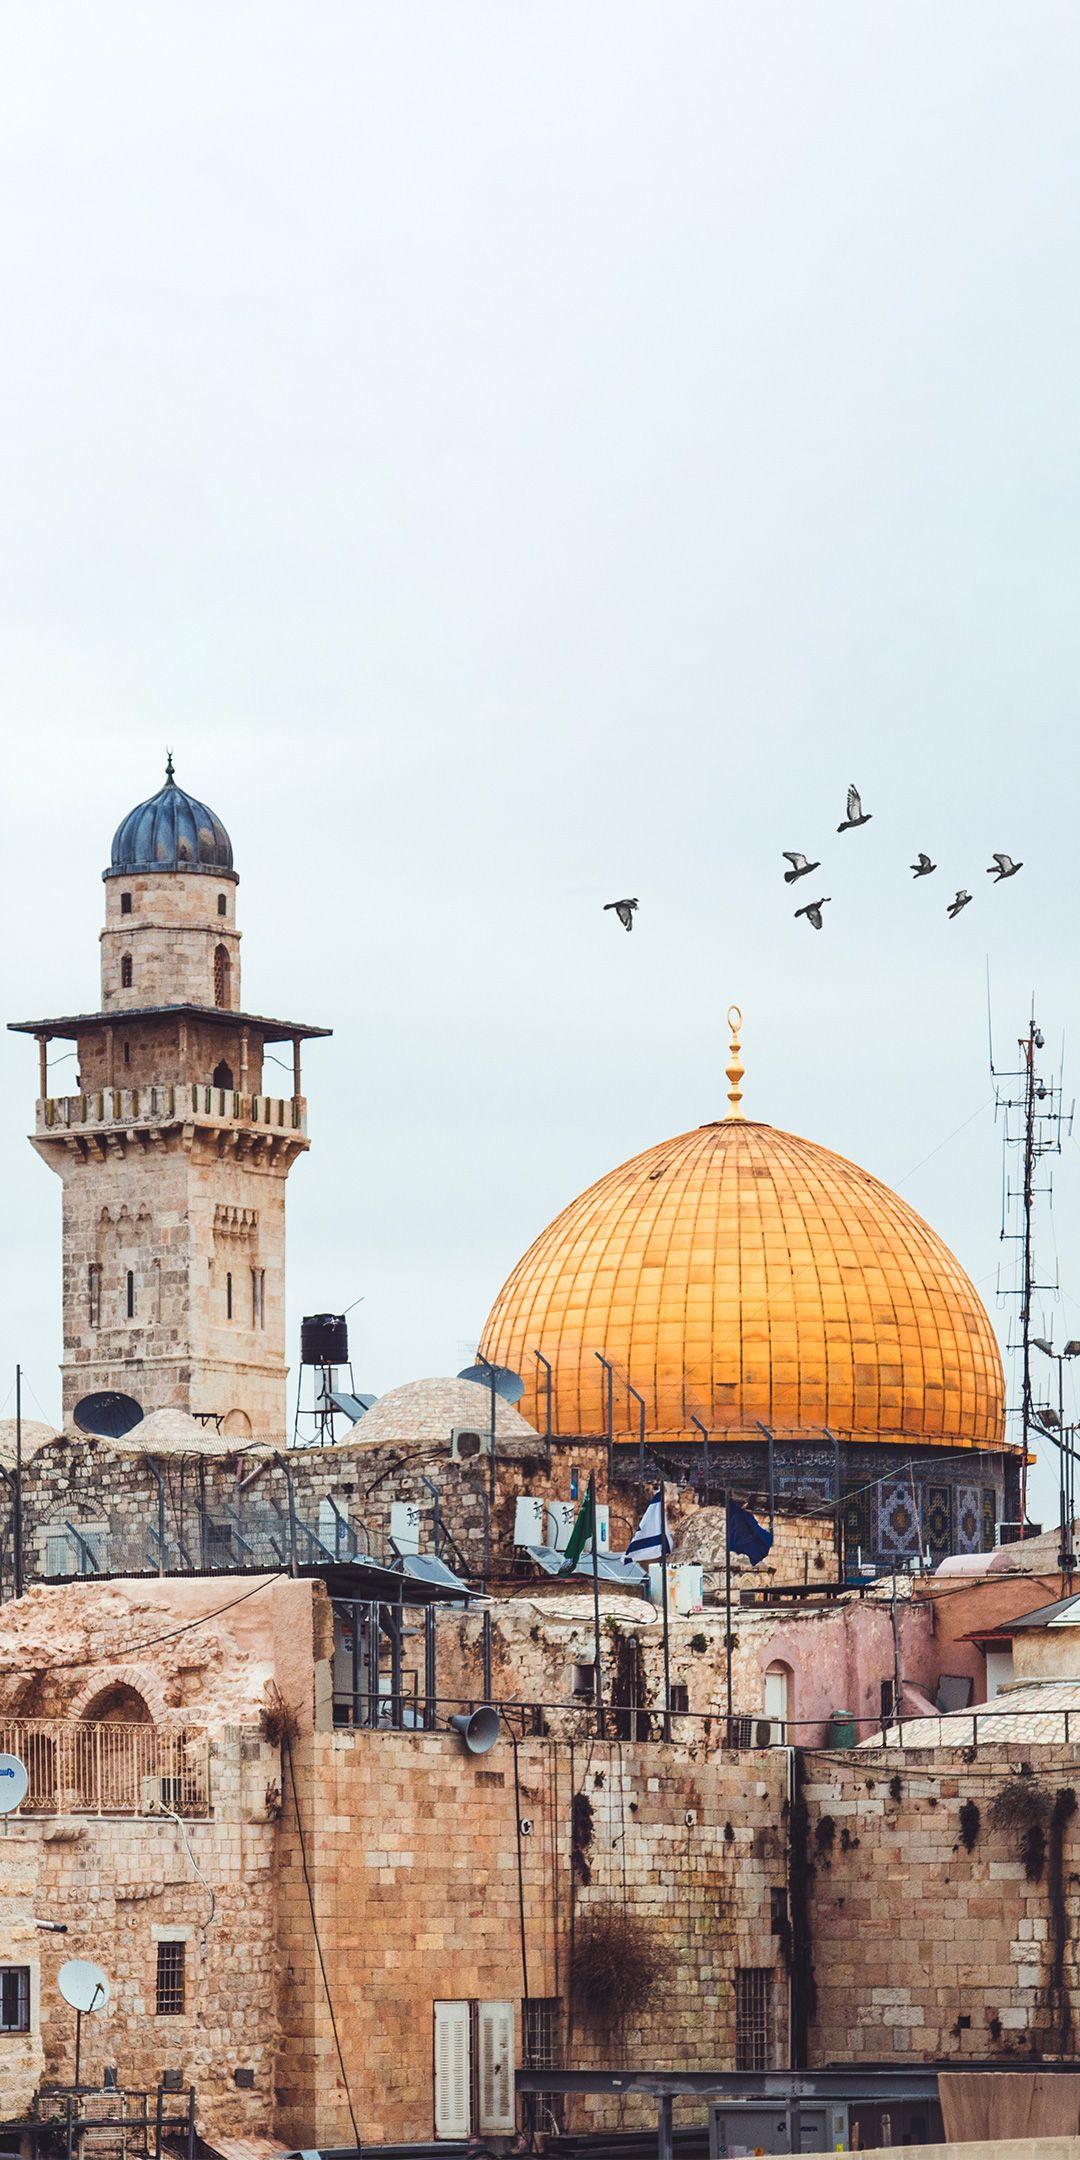 Masjid Al Aqsa Hd Wallpaper And Other Beautiful High Quality Hd Islamic Wallpapers On Islamwallpapers In 2020 Dome Of The Rock Islamic Wallpaper Islamic Wallpaper Hd